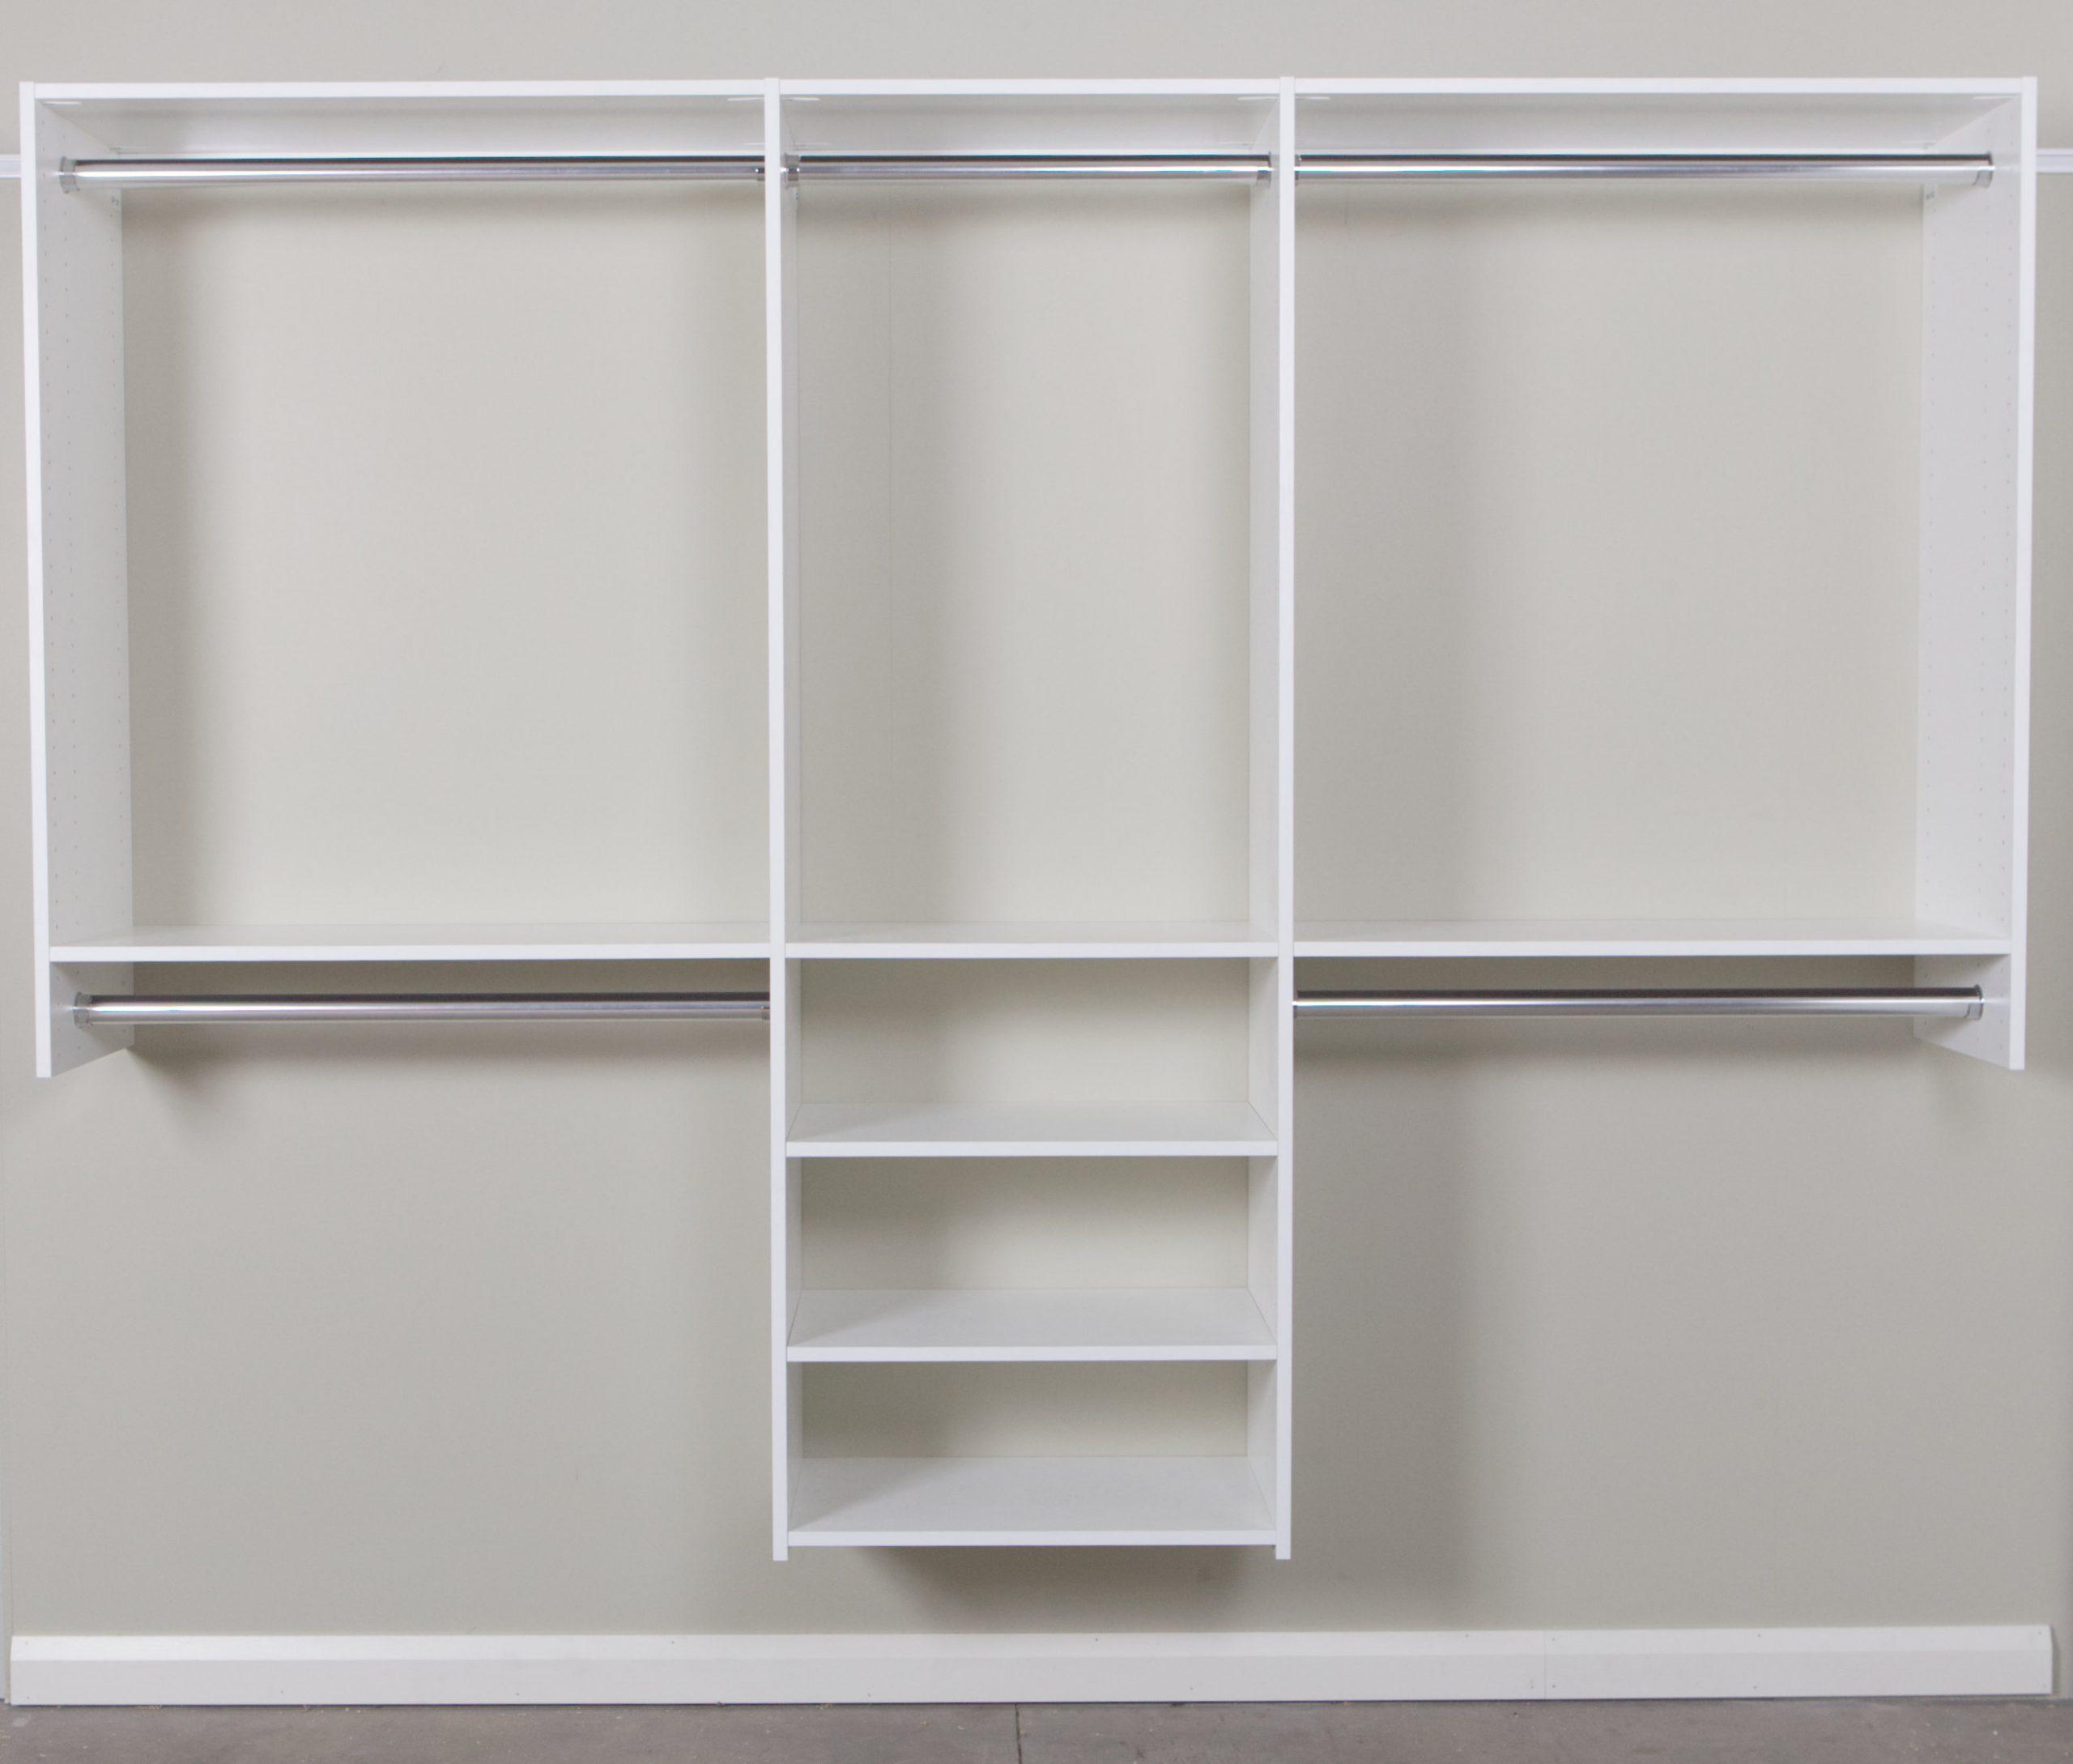 reach in wardrobe three shelves